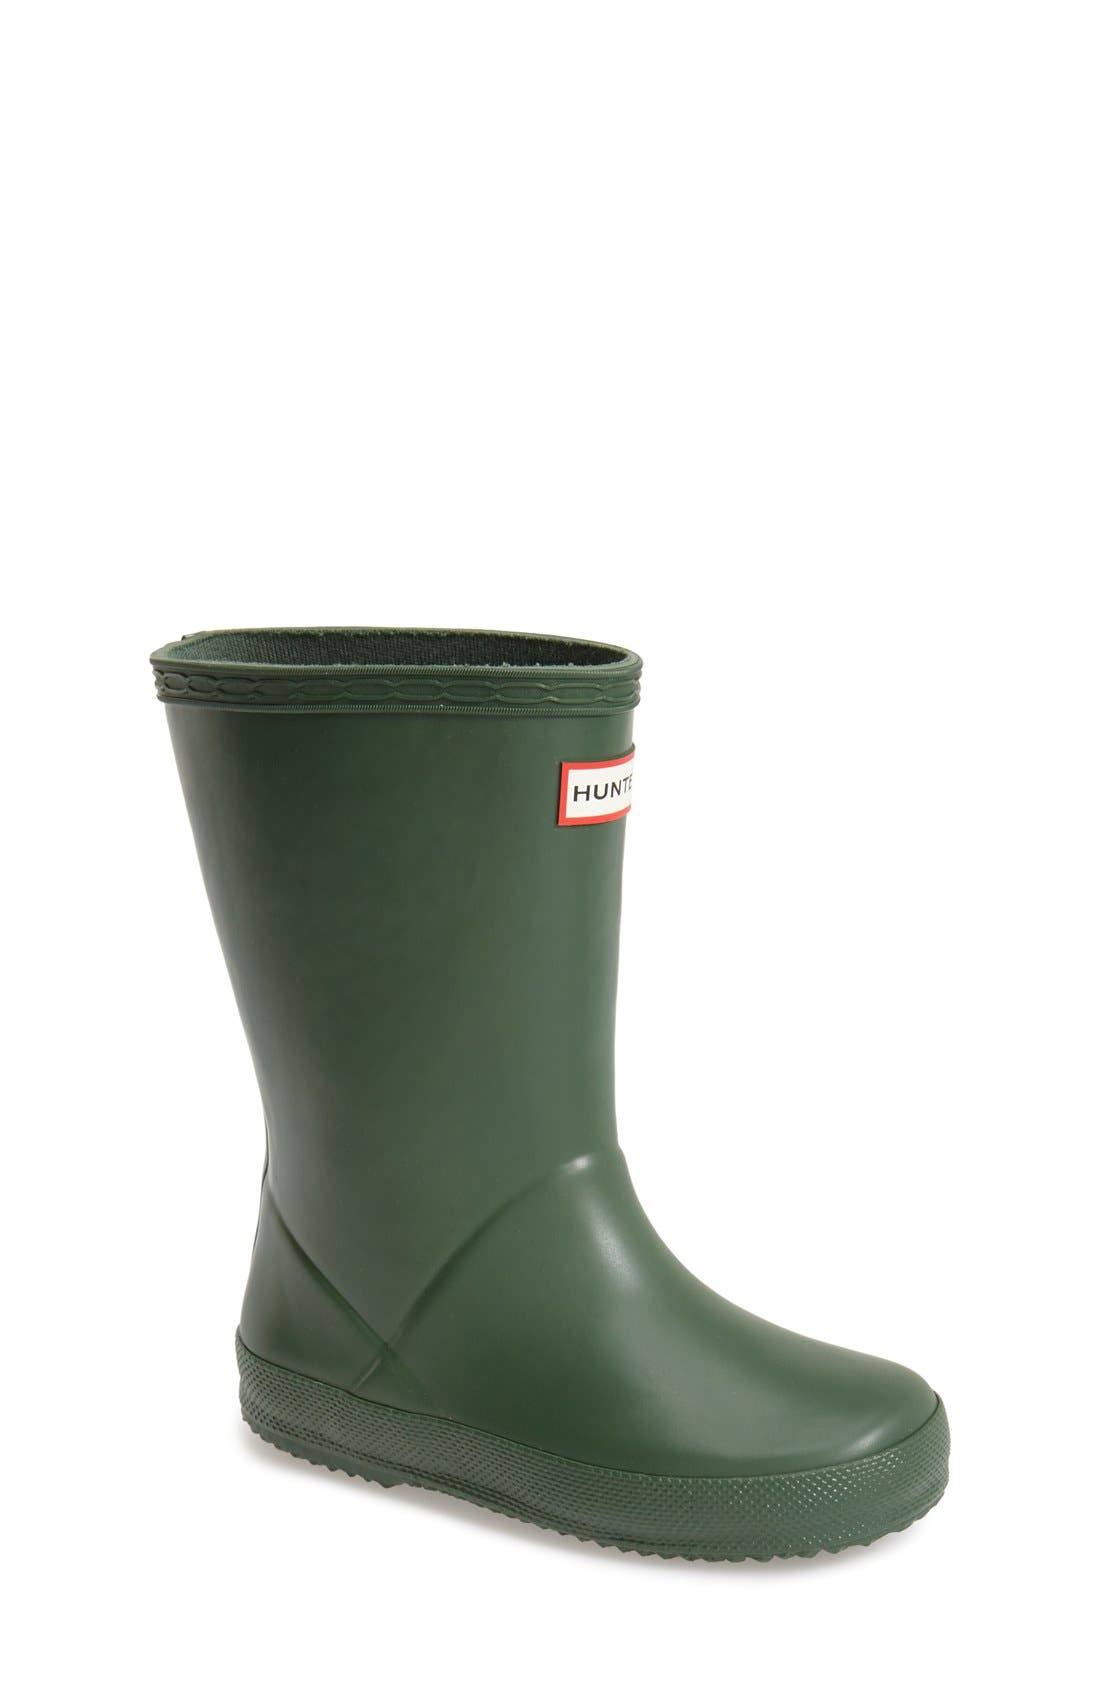 1c99b67690f puma moon boots Sale